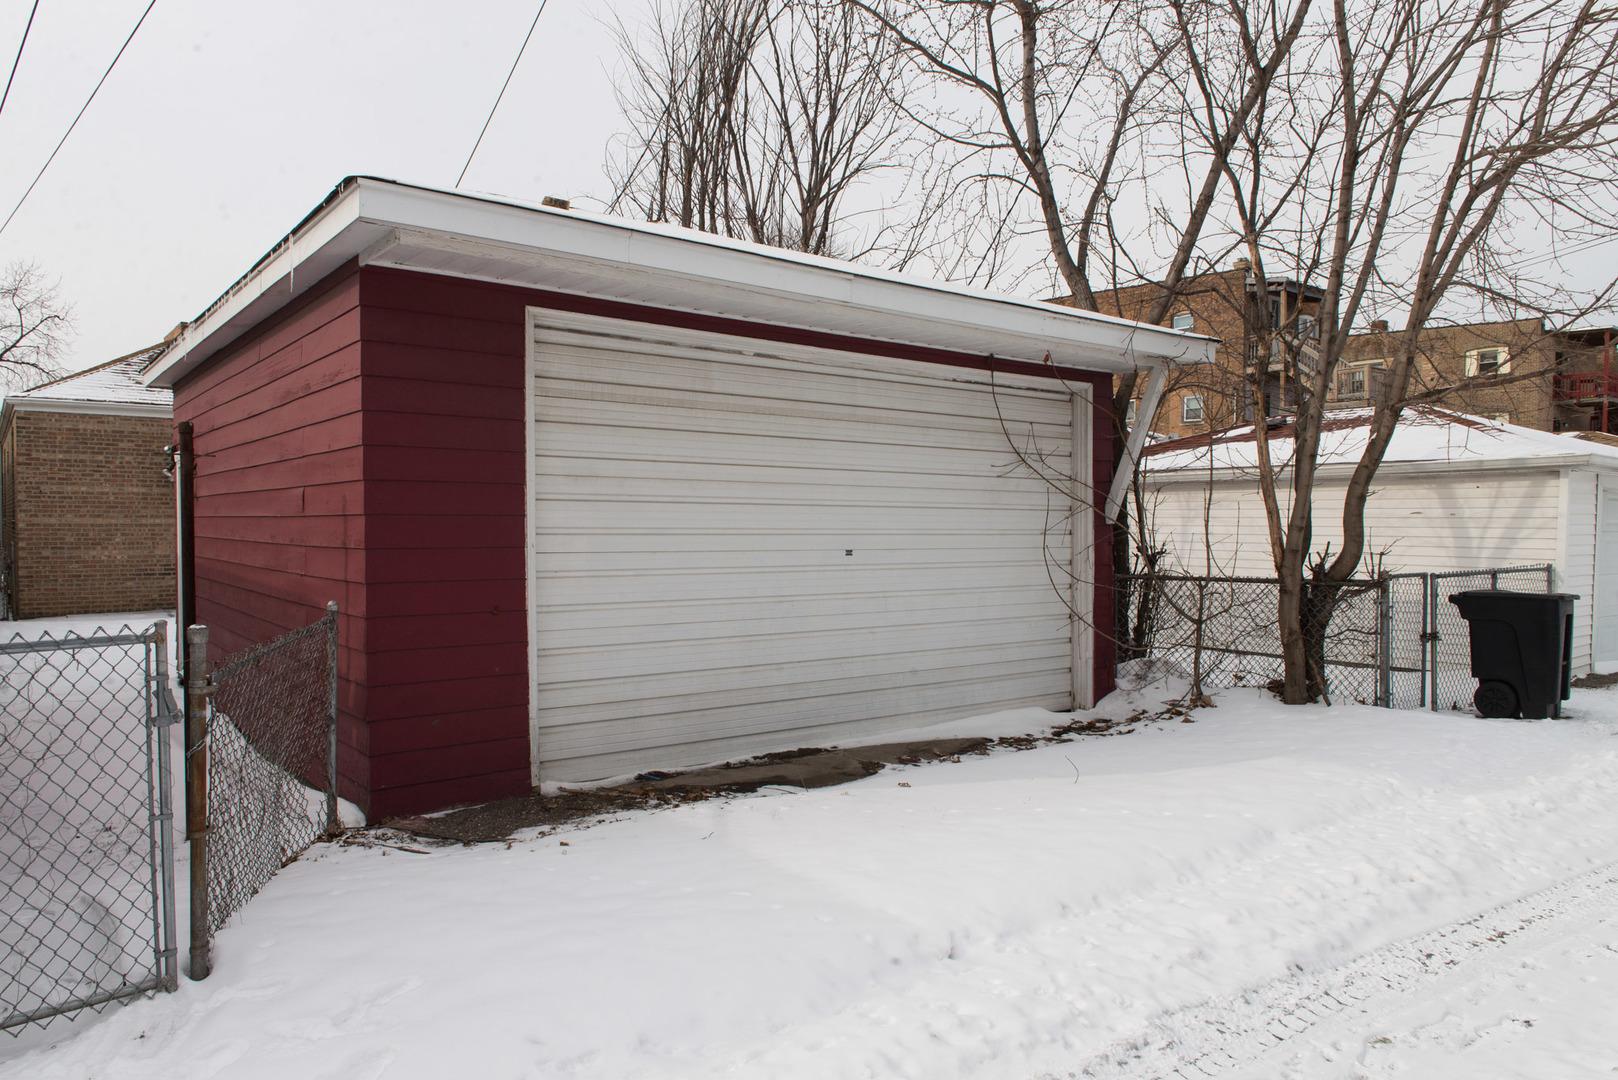 10841 South Calumet, CHICAGO, Illinois, 60628